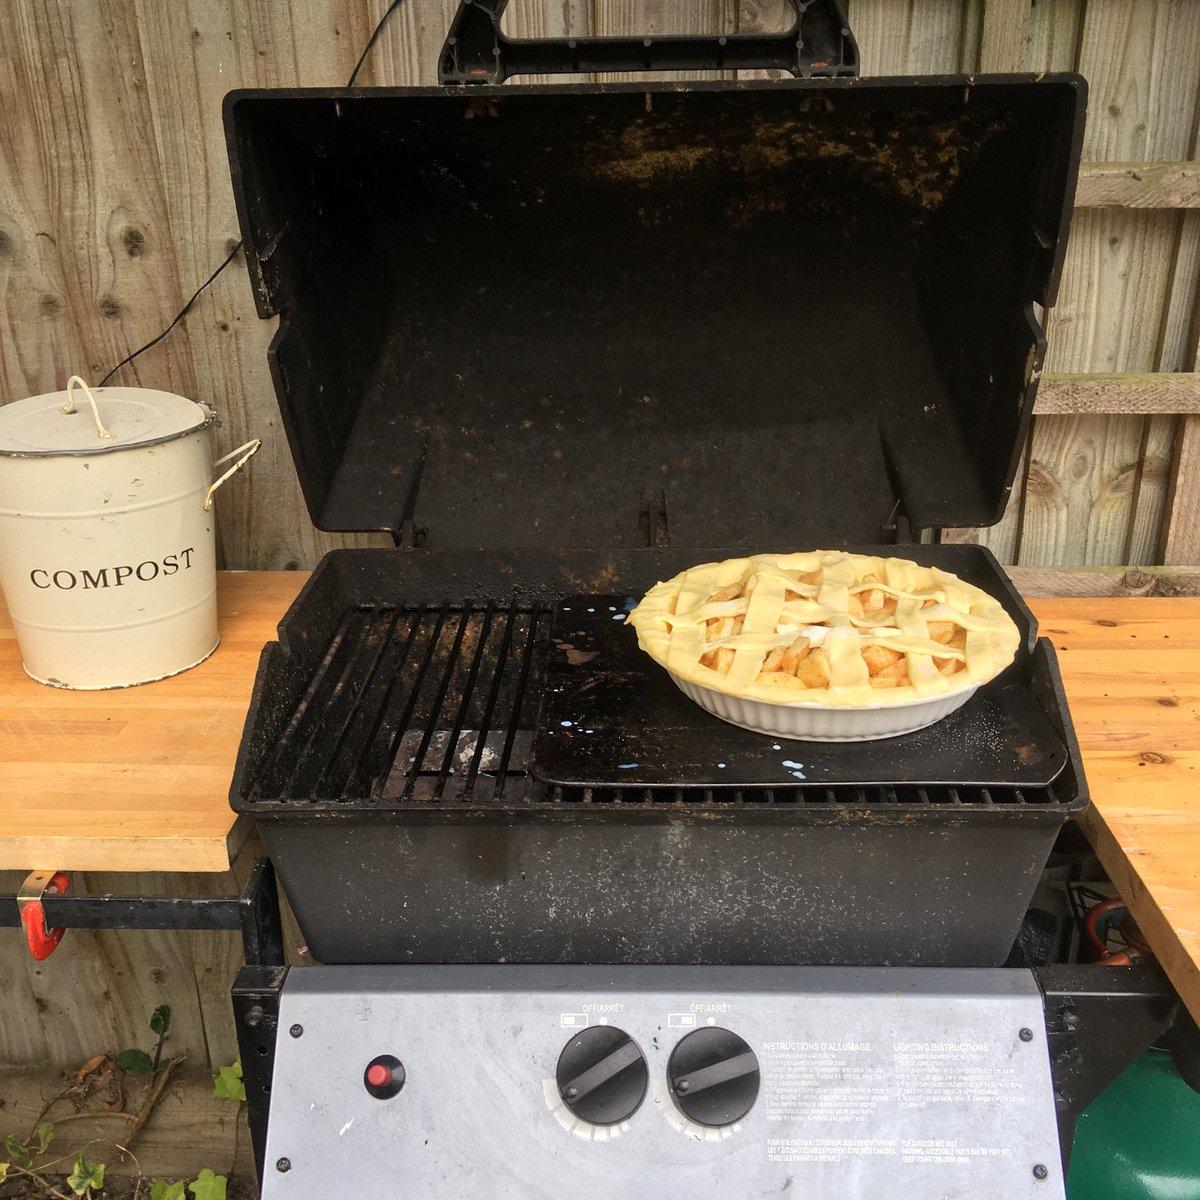 Oven's broken.... attempting apple pie on the offside. Wish me luck... #bbq pic.twitter.com/oJMdFmTYNj